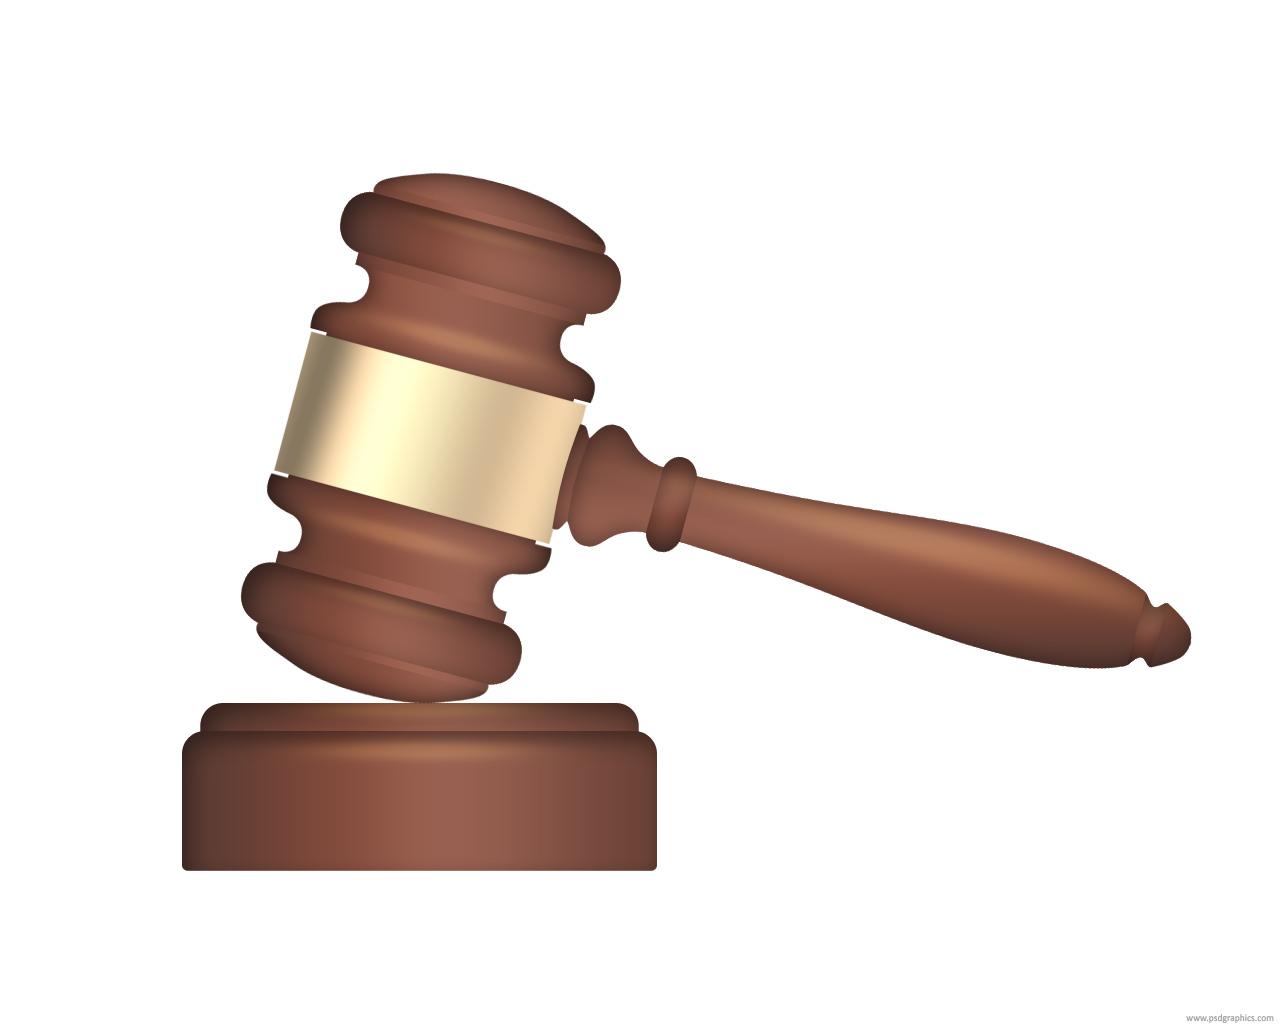 hight resolution of gavel court hammer clipart clipart kid